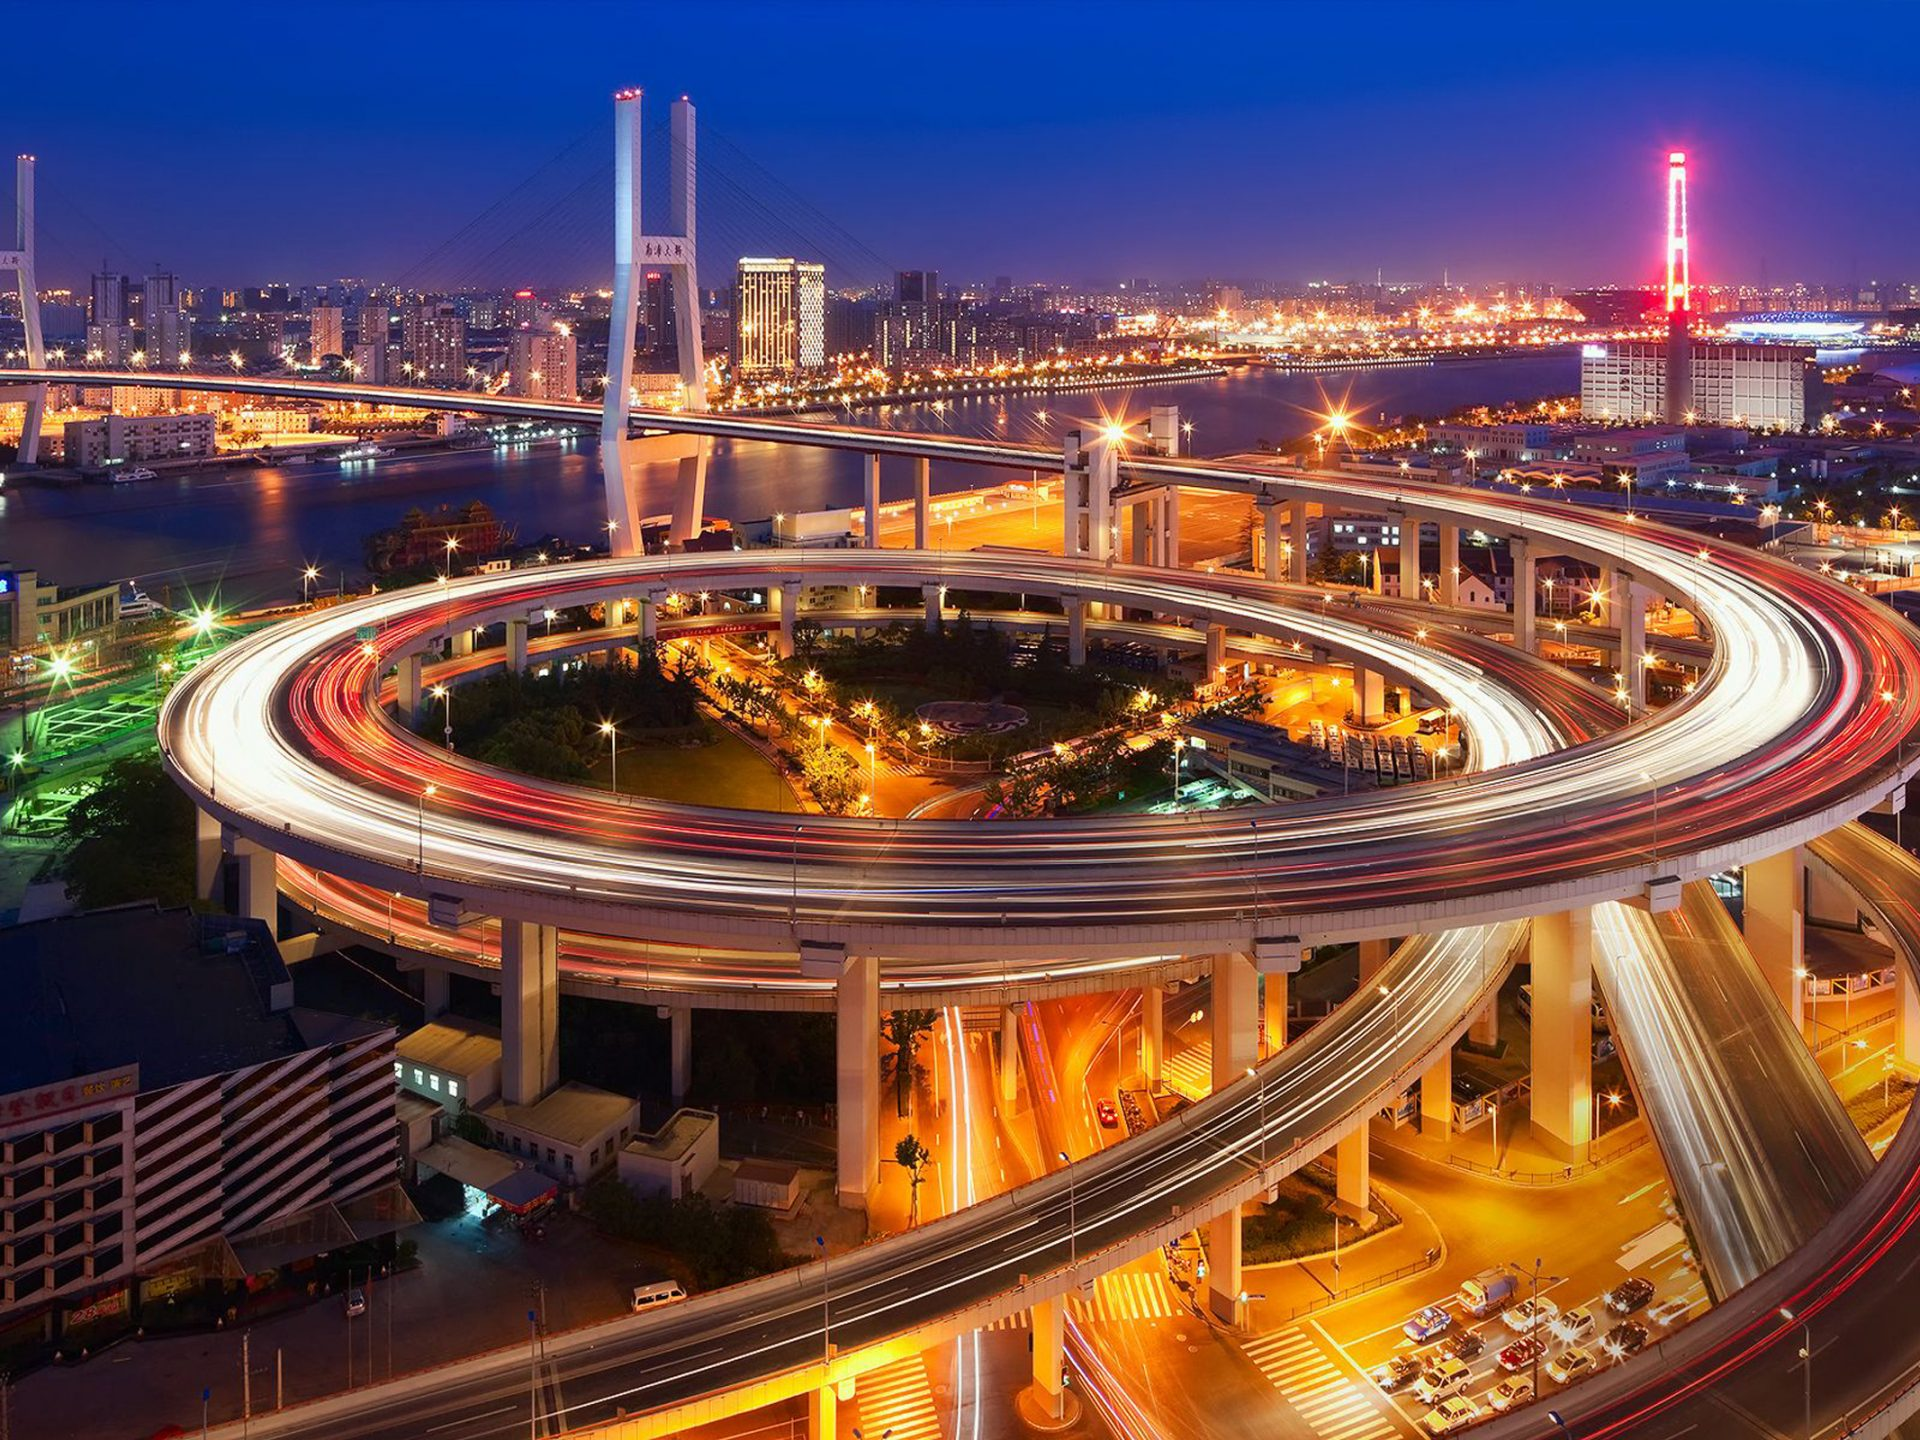 Circular-overpass-in-the-city-of-Shanghai-Nanpu-Bridge-evening-night-lights-China-Desktop-Wallpaper-HD-2560x1600-1920x1440